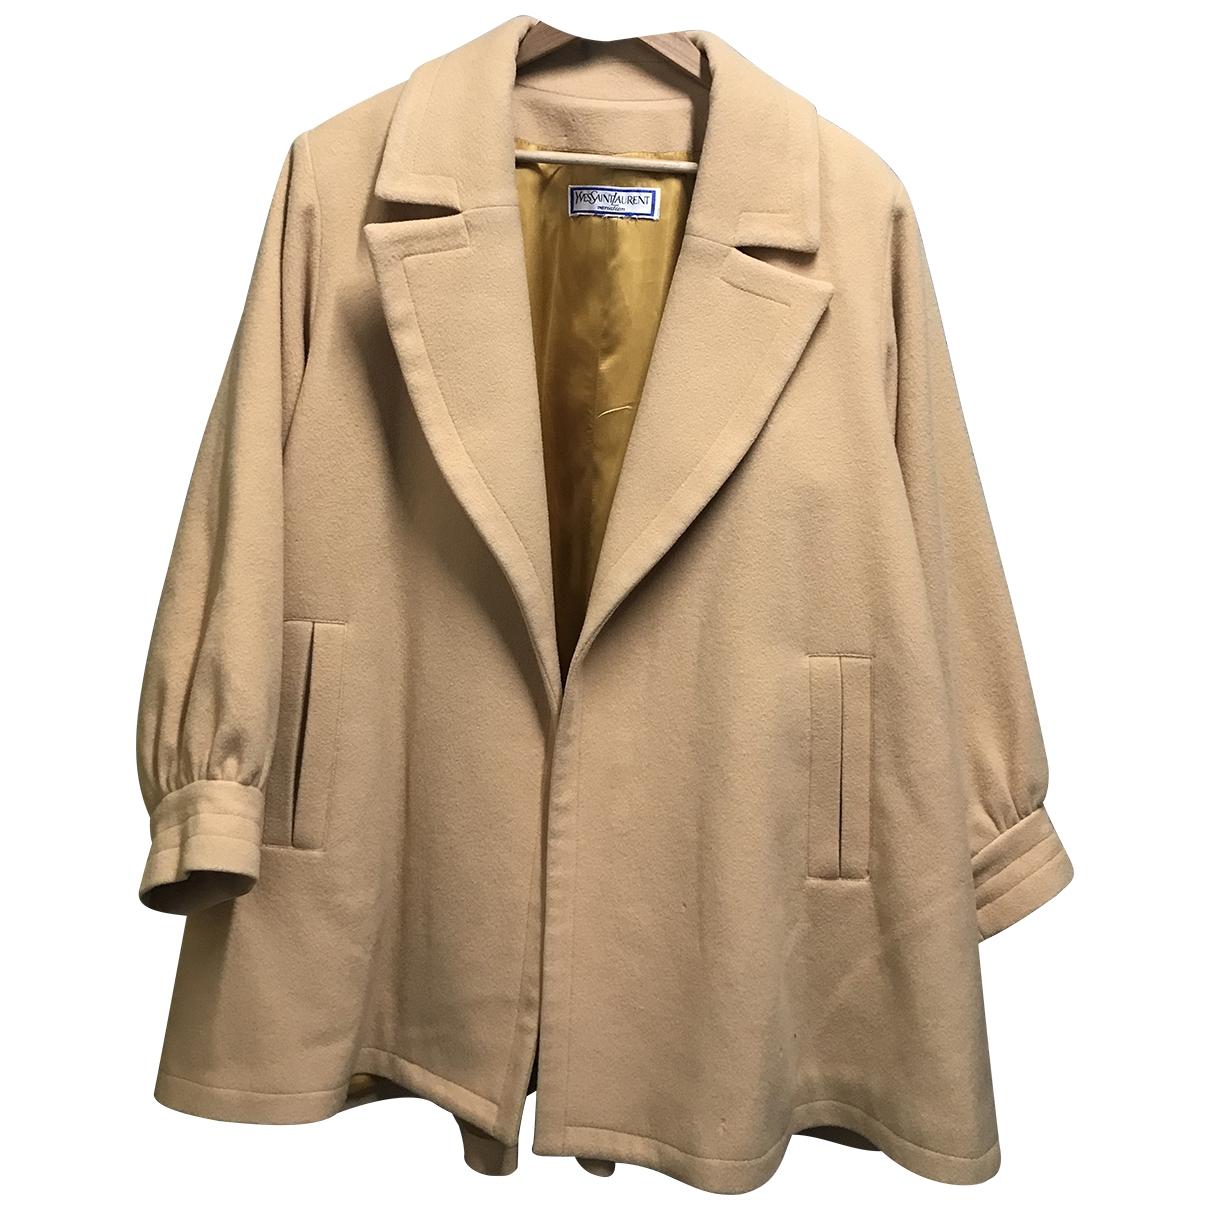 Yves Saint Laurent \N Ecru Wool coat for Women One Size FR